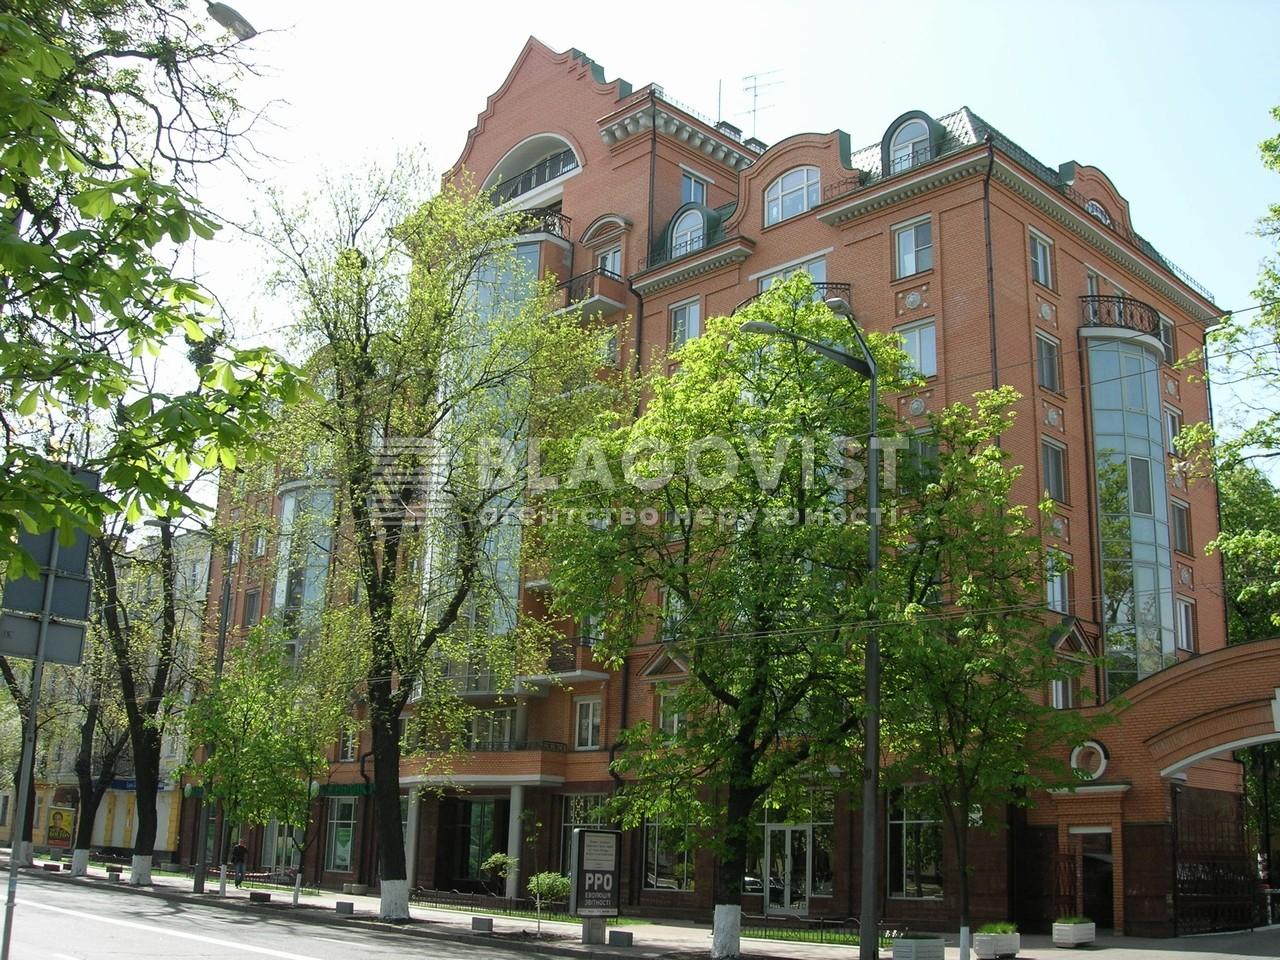 Квартира M-13580, Мазепы Ивана (Январского Восстания), 10, Киев - Фото 1